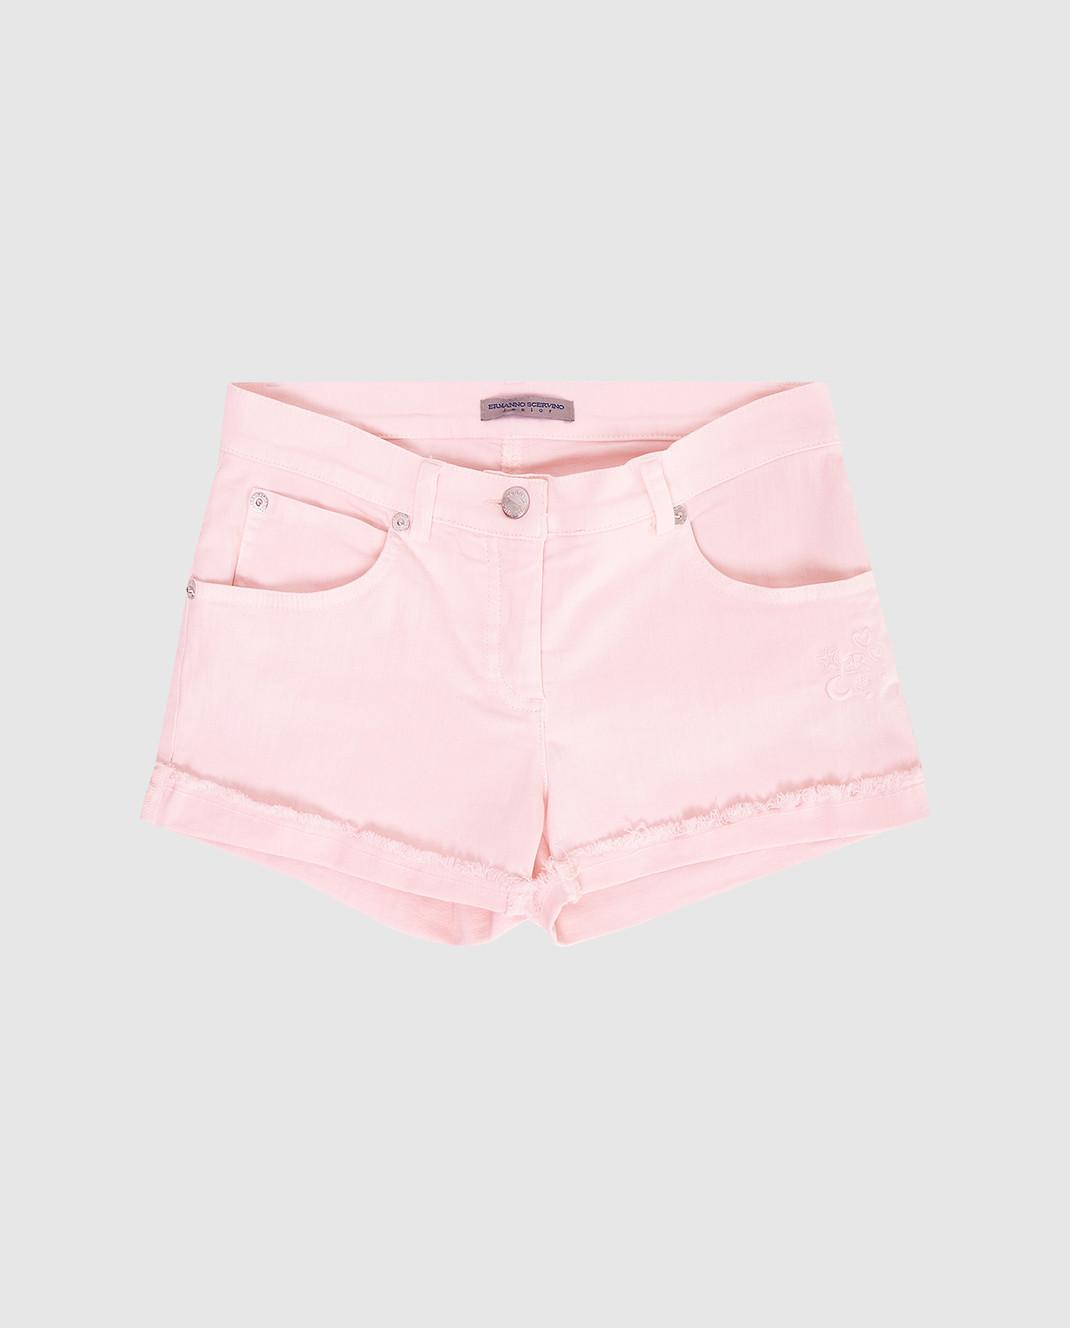 Ermanno Scervino Детские розовые шорты PC061014